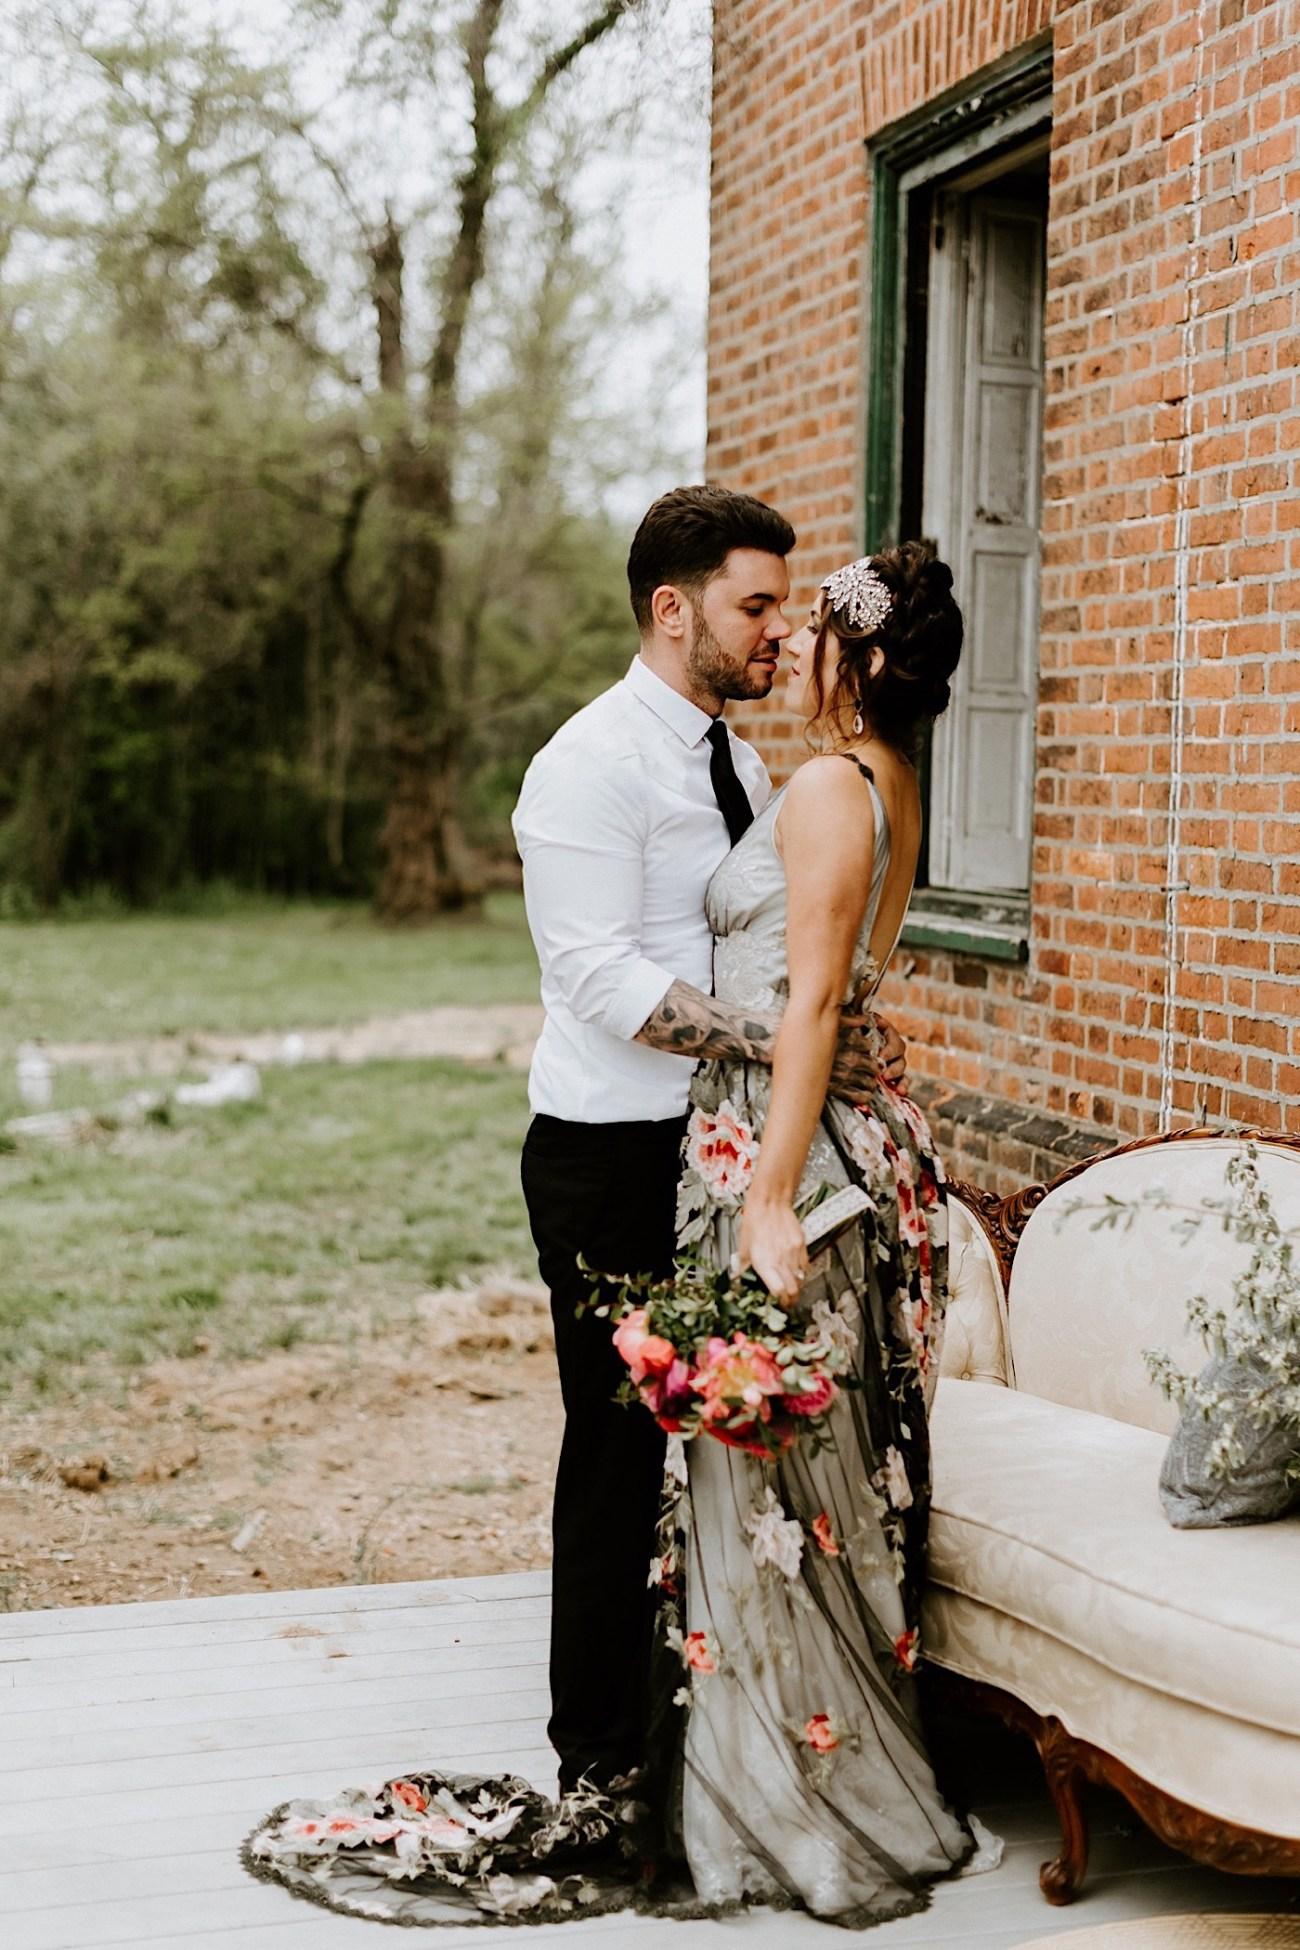 Romantic Phildalephia Wedding Photographer Philadelphia Wedding Venue Barnsley Manor Wedding 52